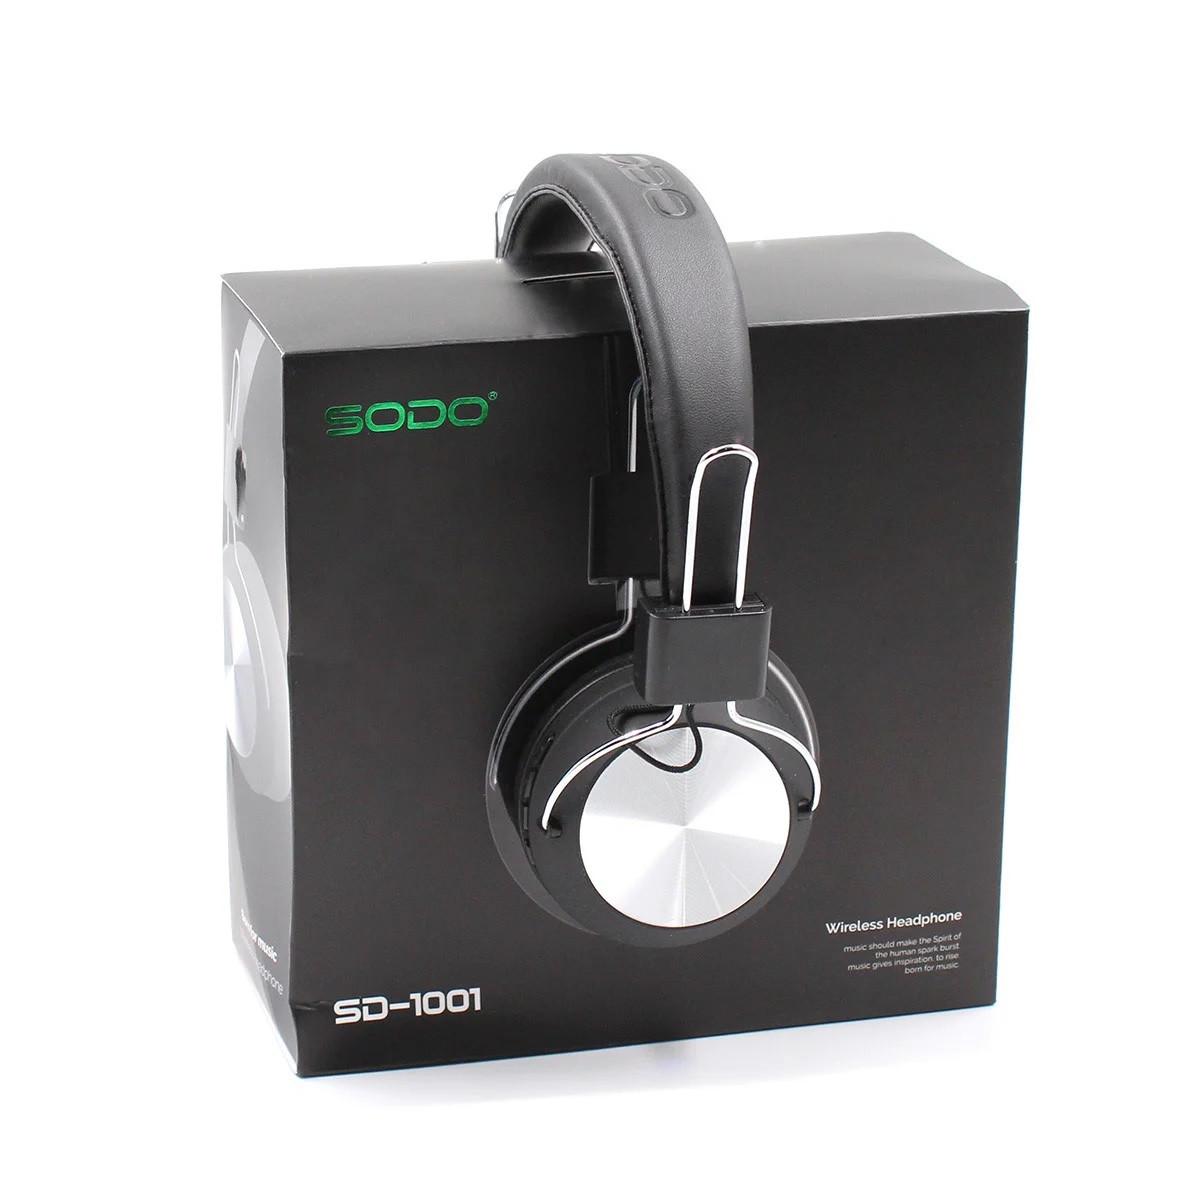 Навушники MDR ST 1001BT SODO black